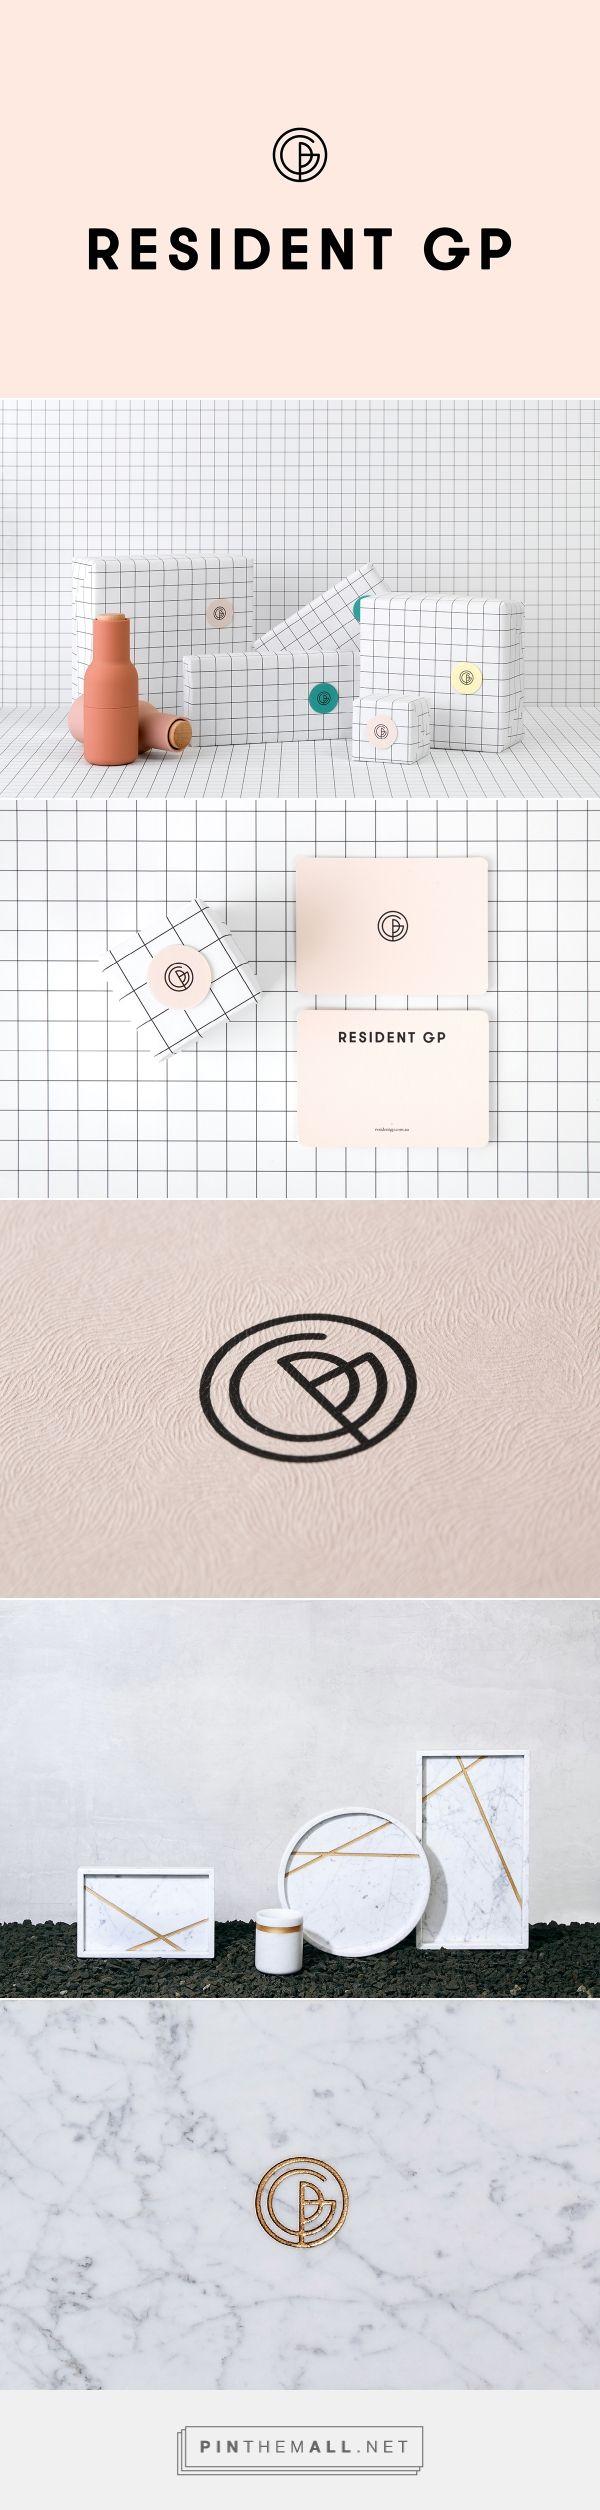 Resident GP homeware packaging design by A Friend Of Mine Design Studio (Australia) - http://www.packagingoftheworld.com/2016/08/resident-gp.html